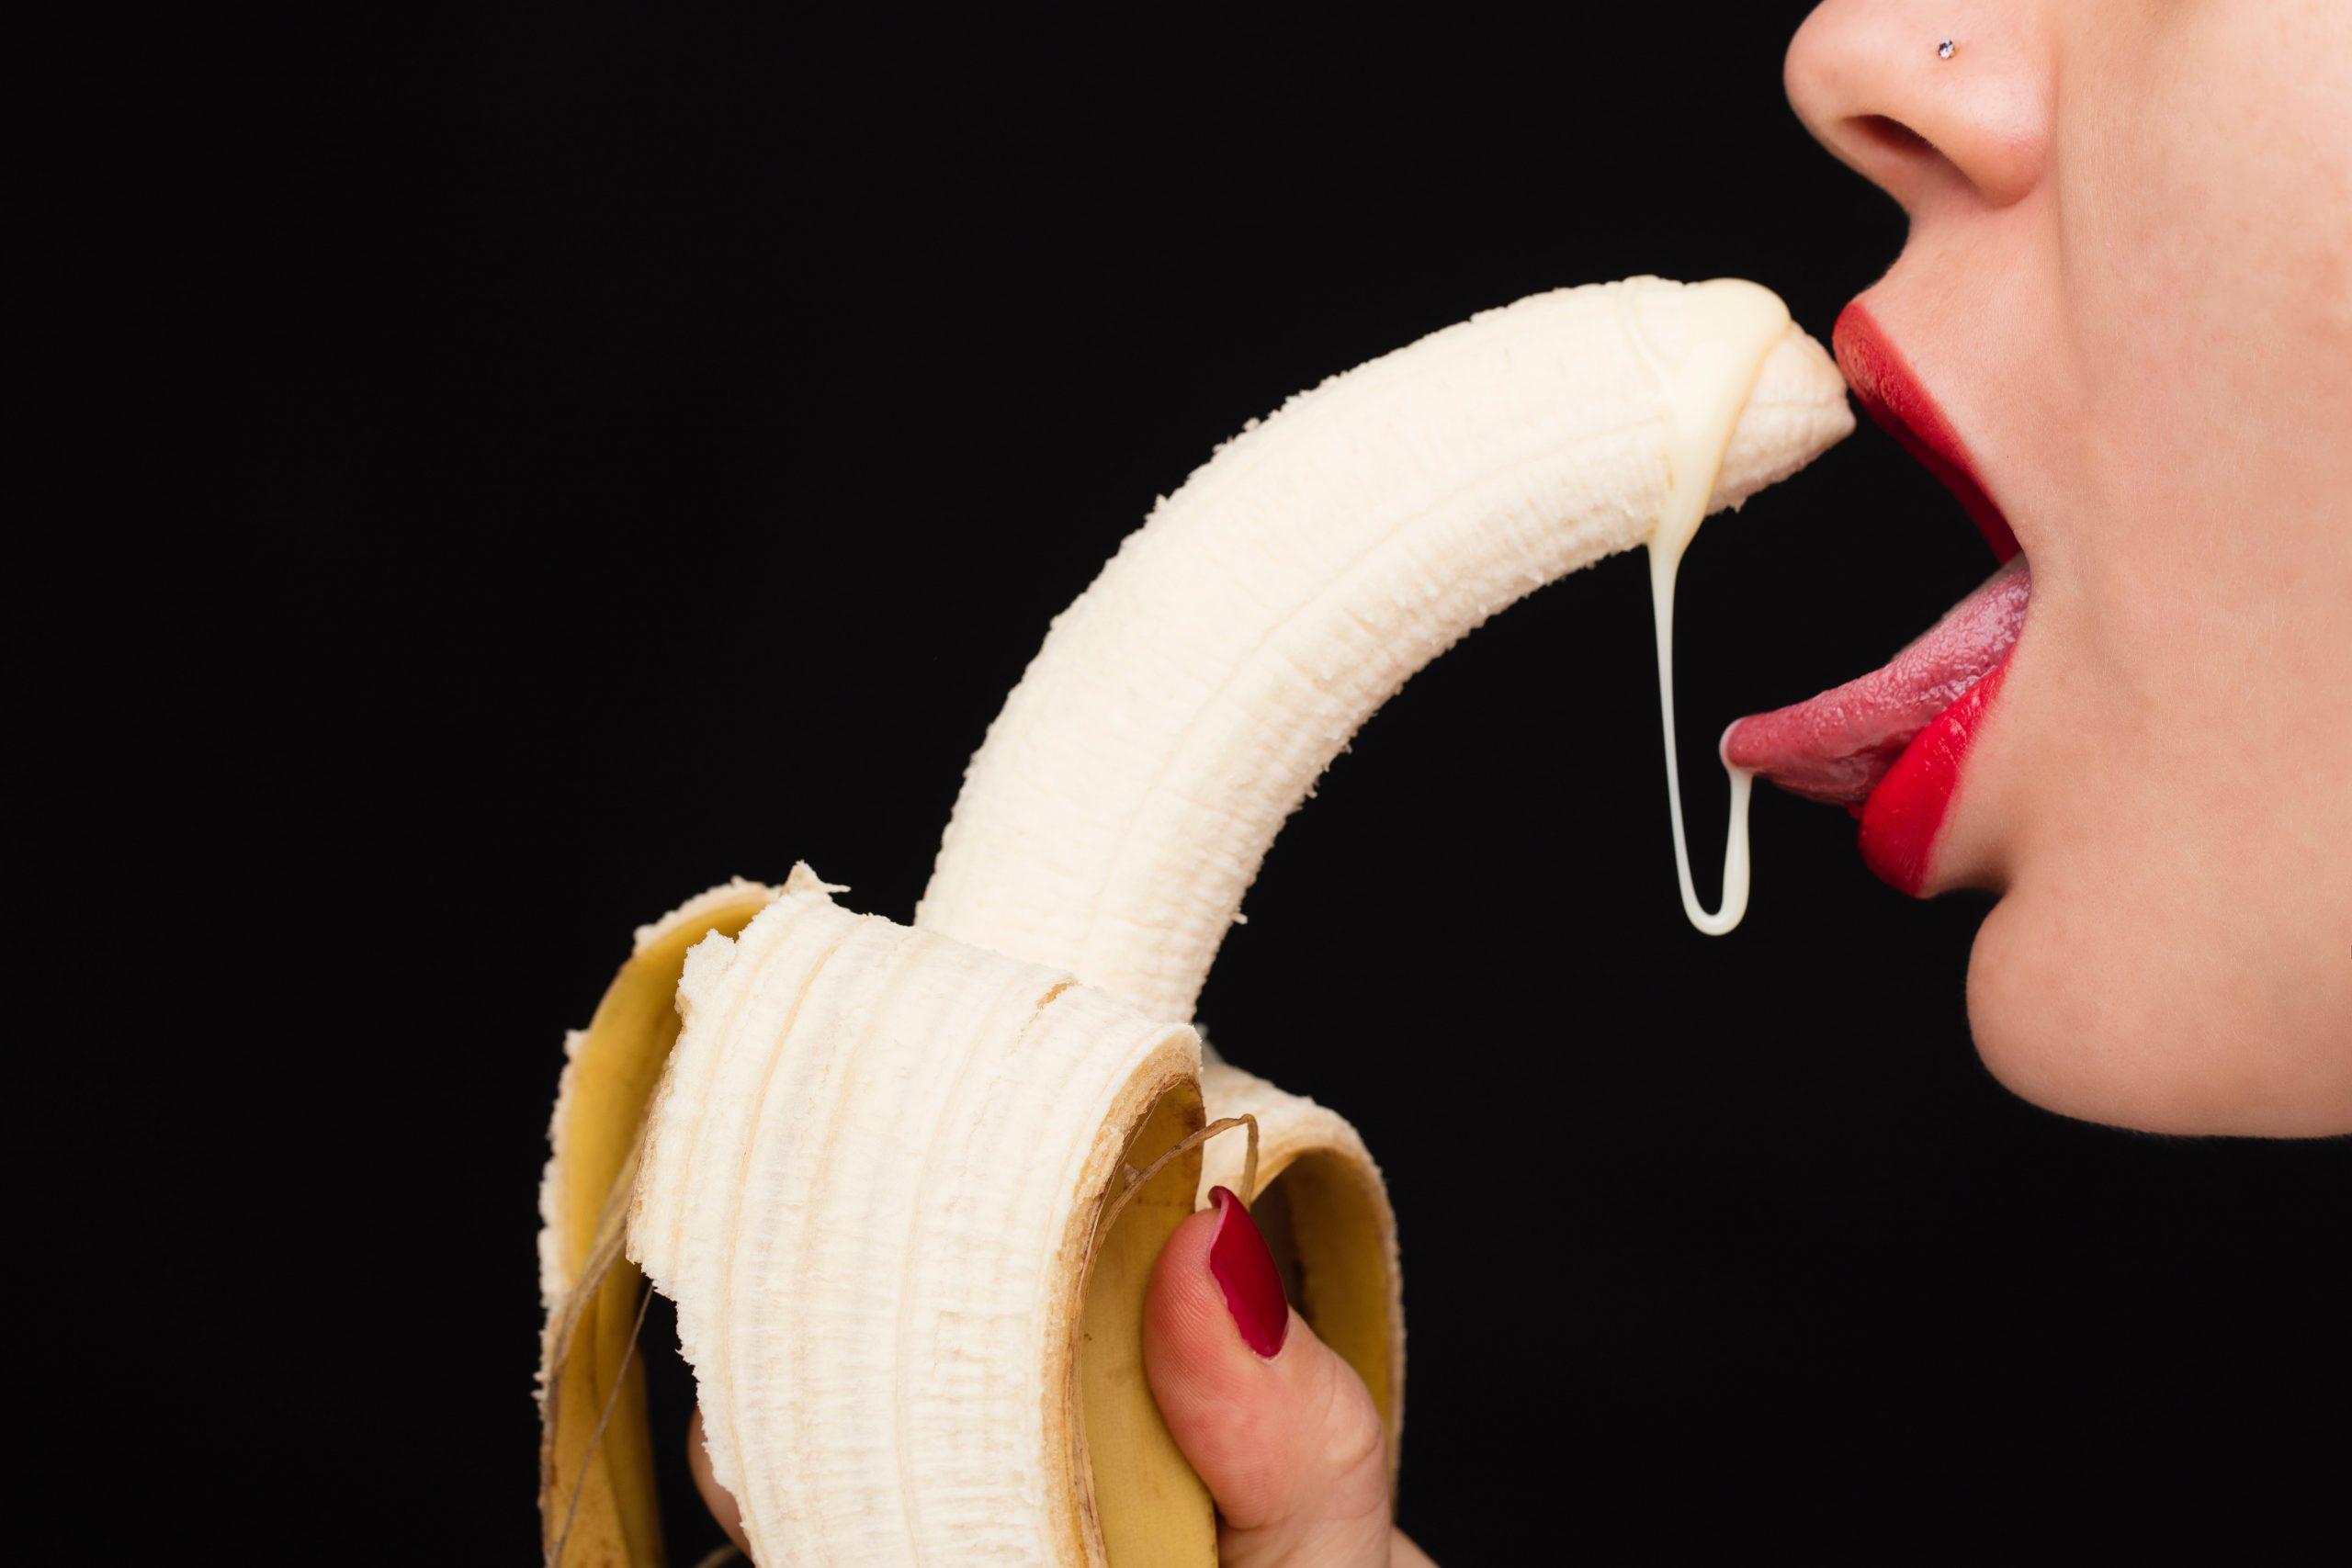 banana licked by woman